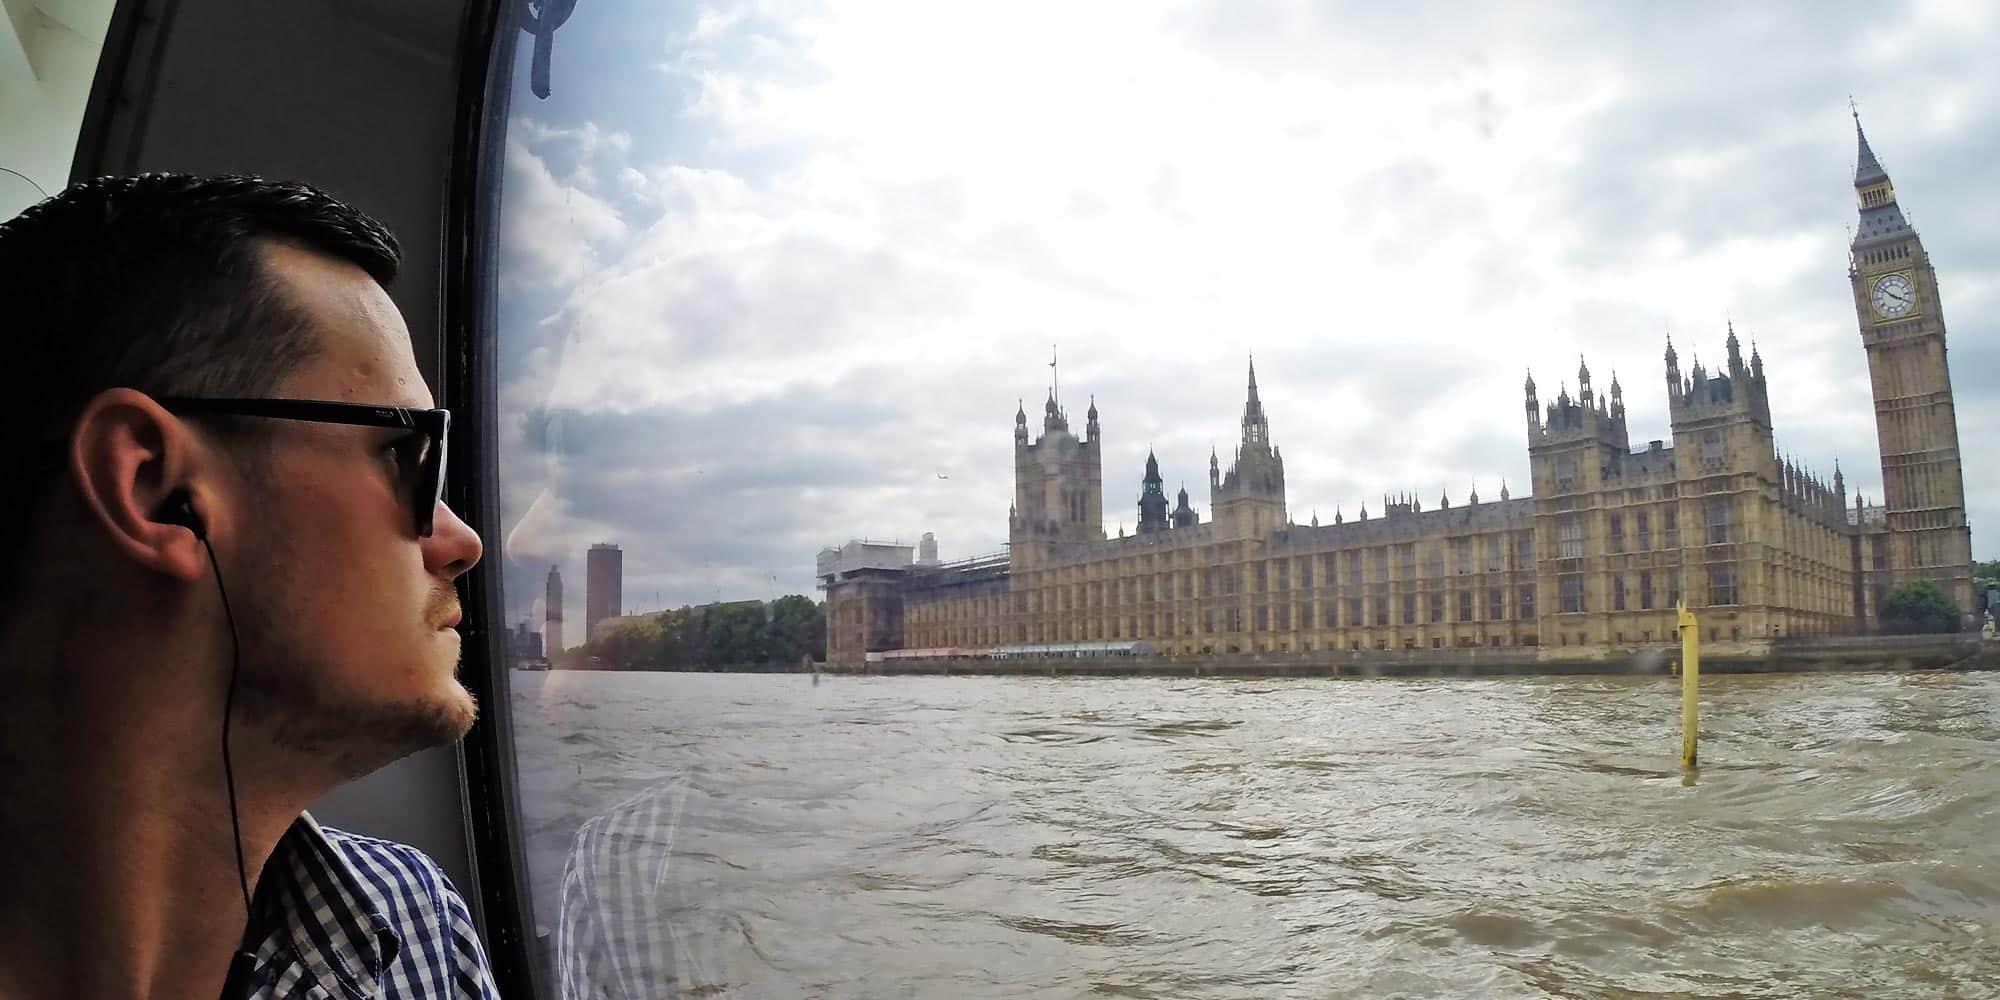 LondonMeBoat